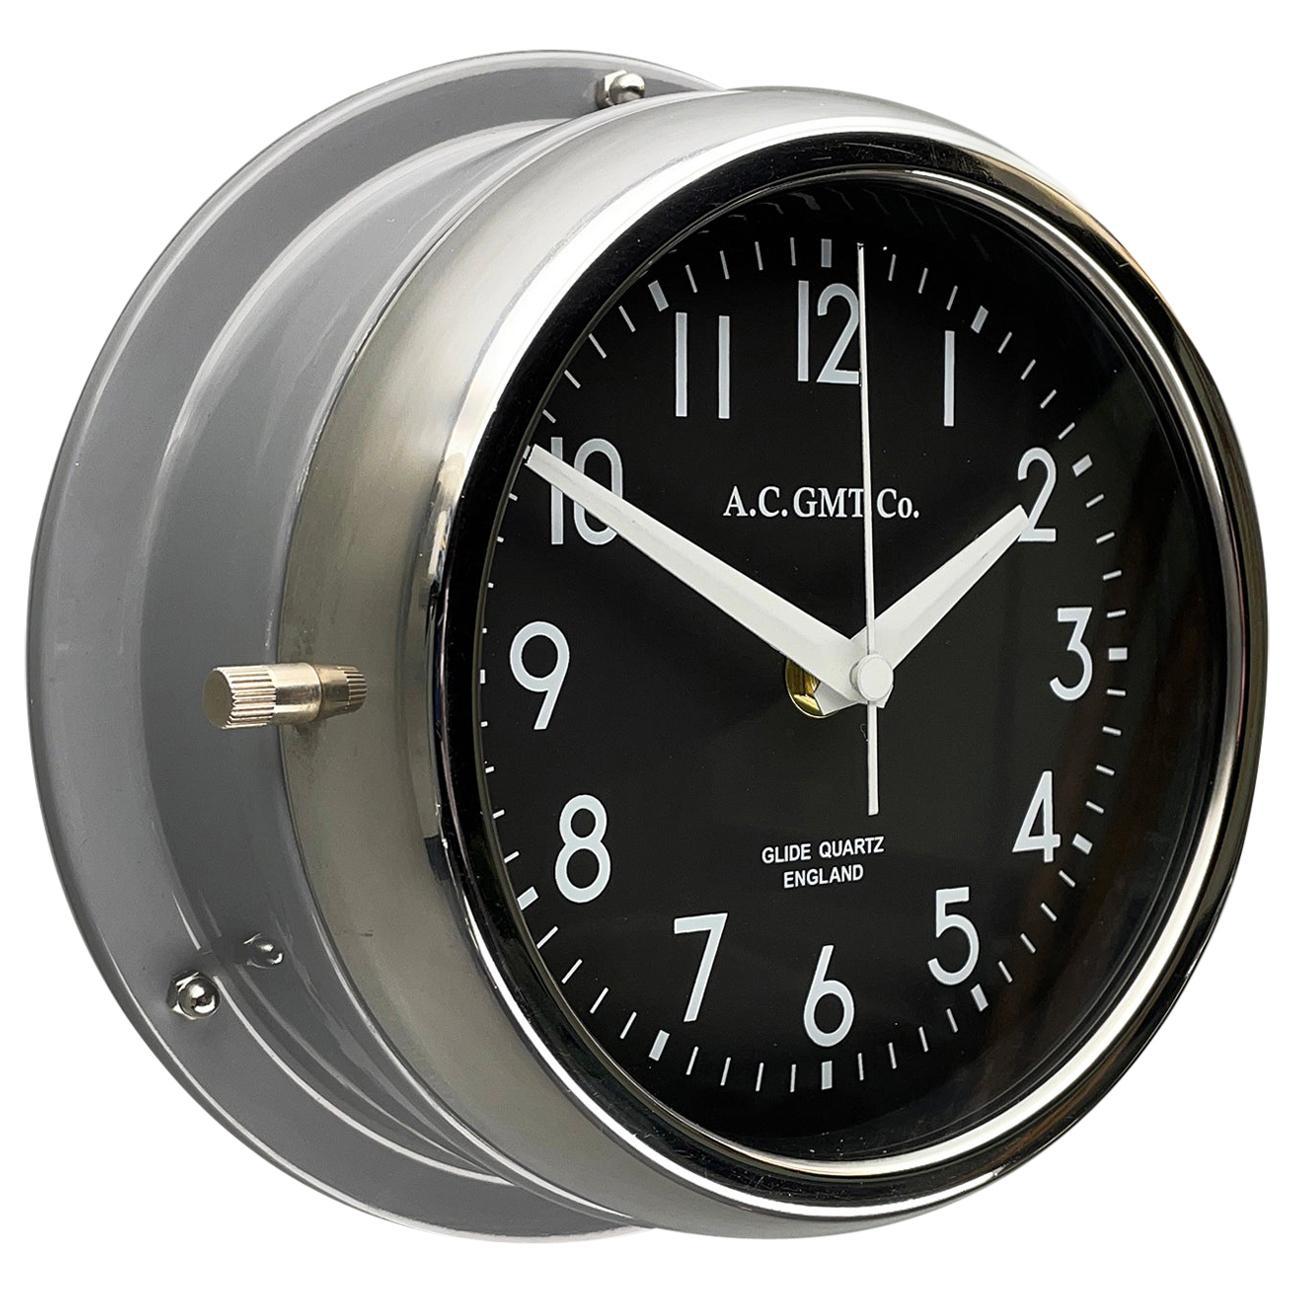 1970's British Ultimate Gray /Monochrome Black AC GMT Co. Classic Wall Clock